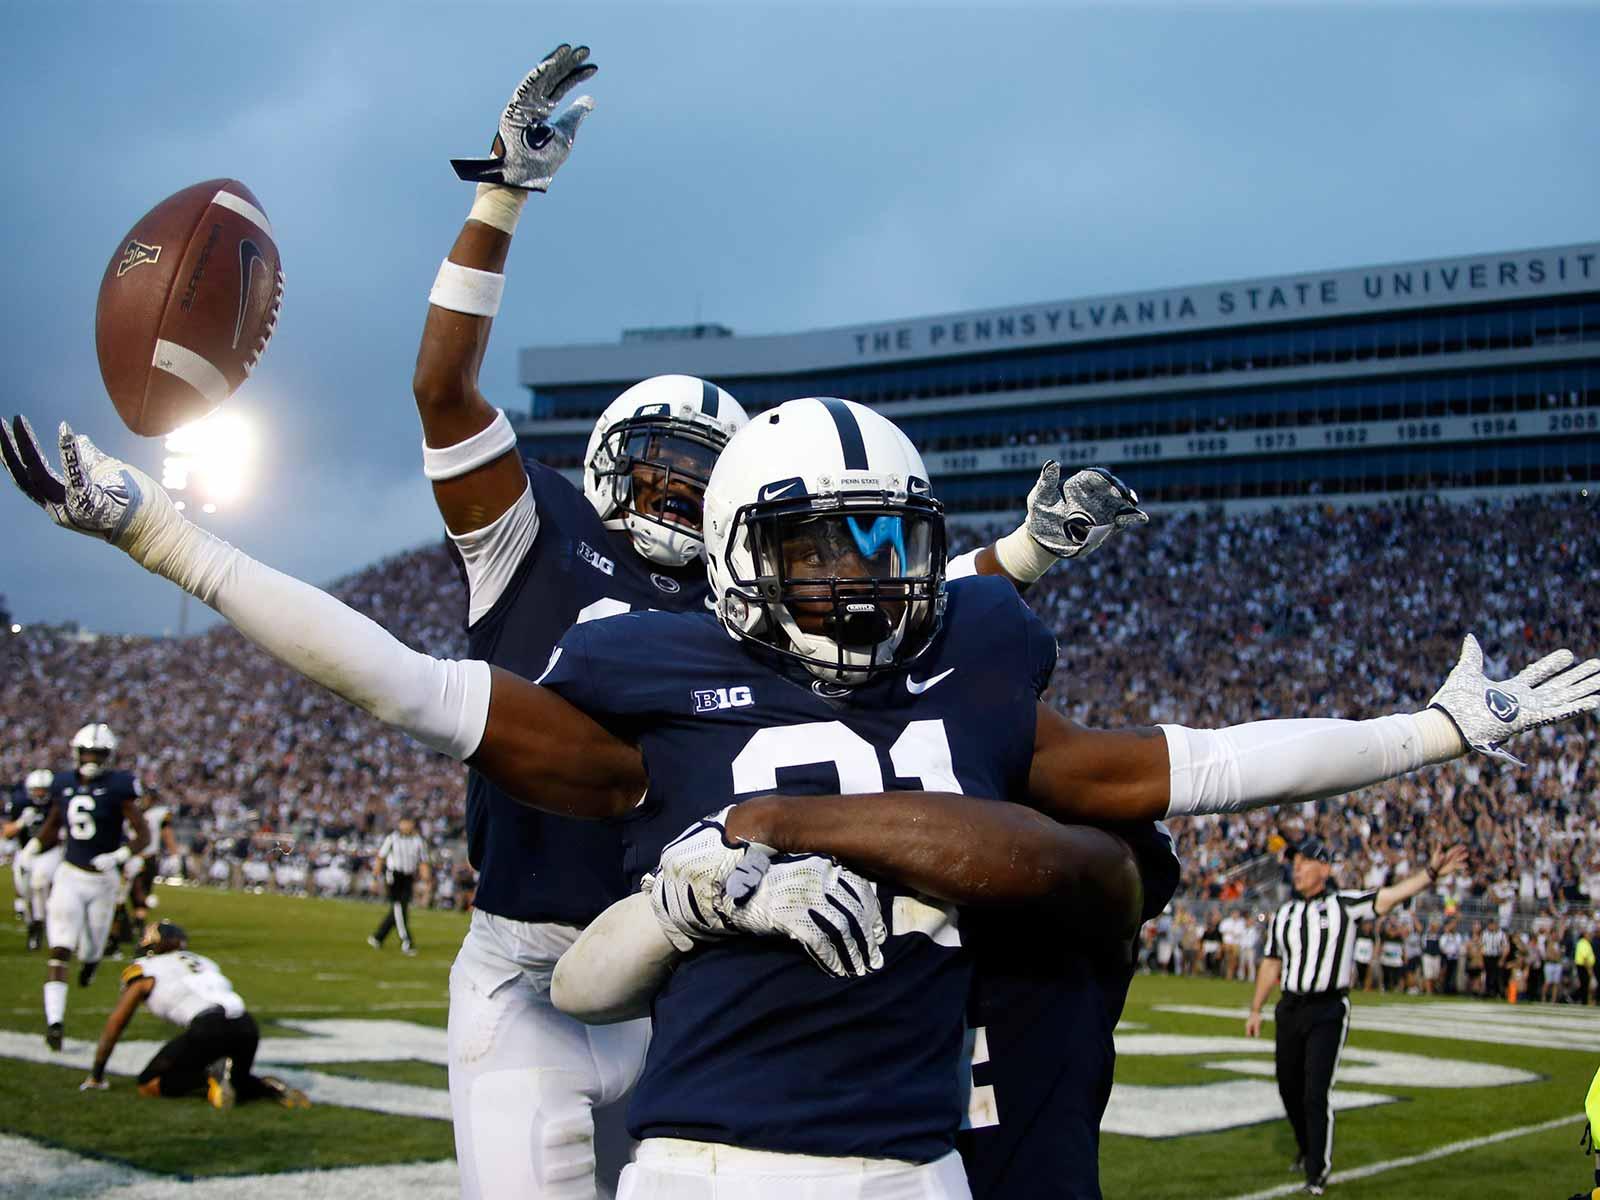 Amani Oruwariye interception seals Penn State win over App State